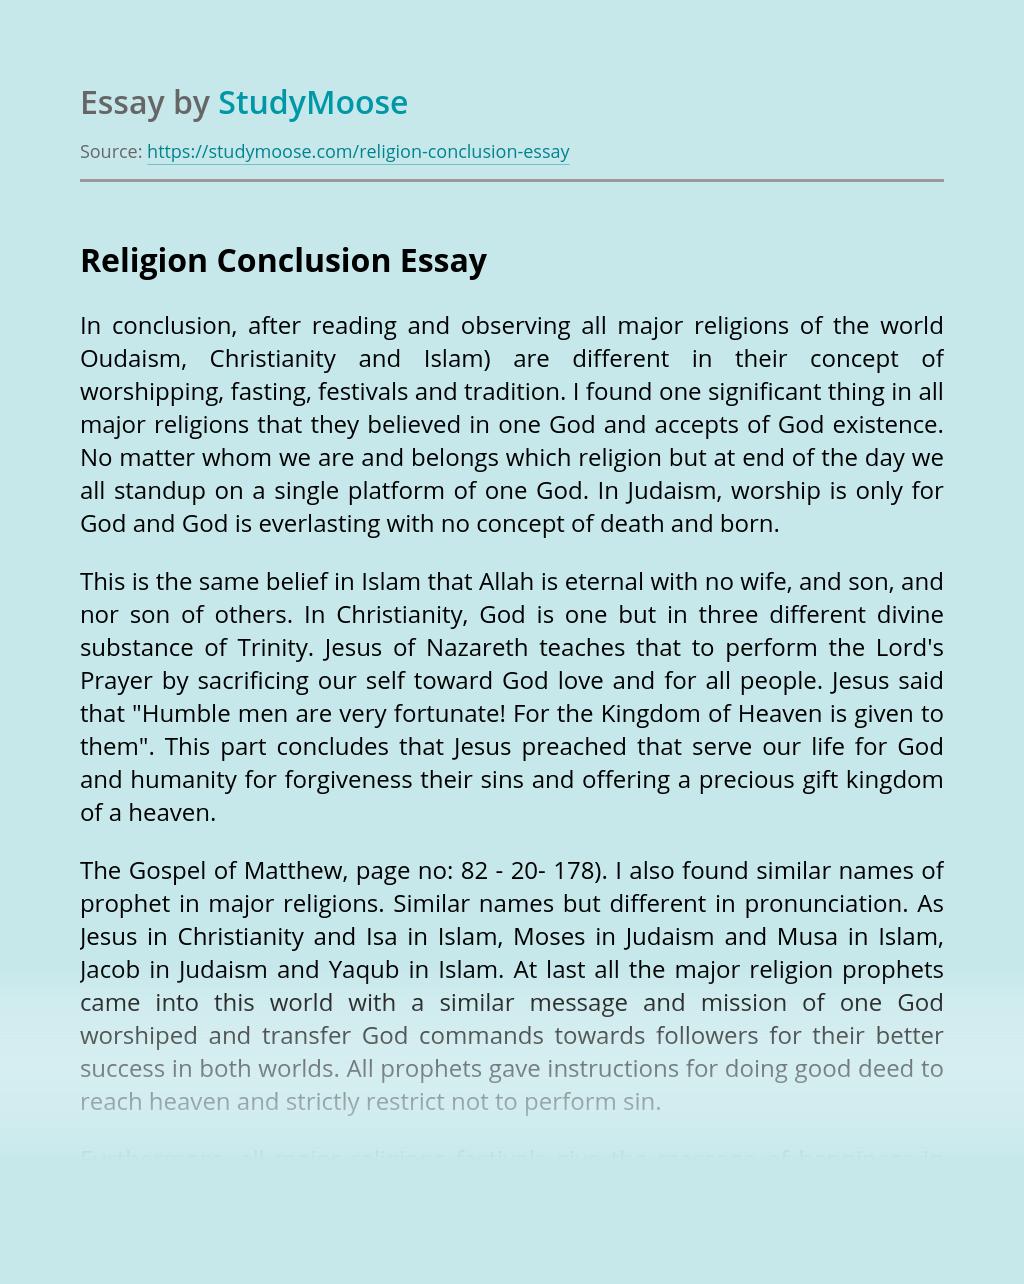 Religion Conclusion